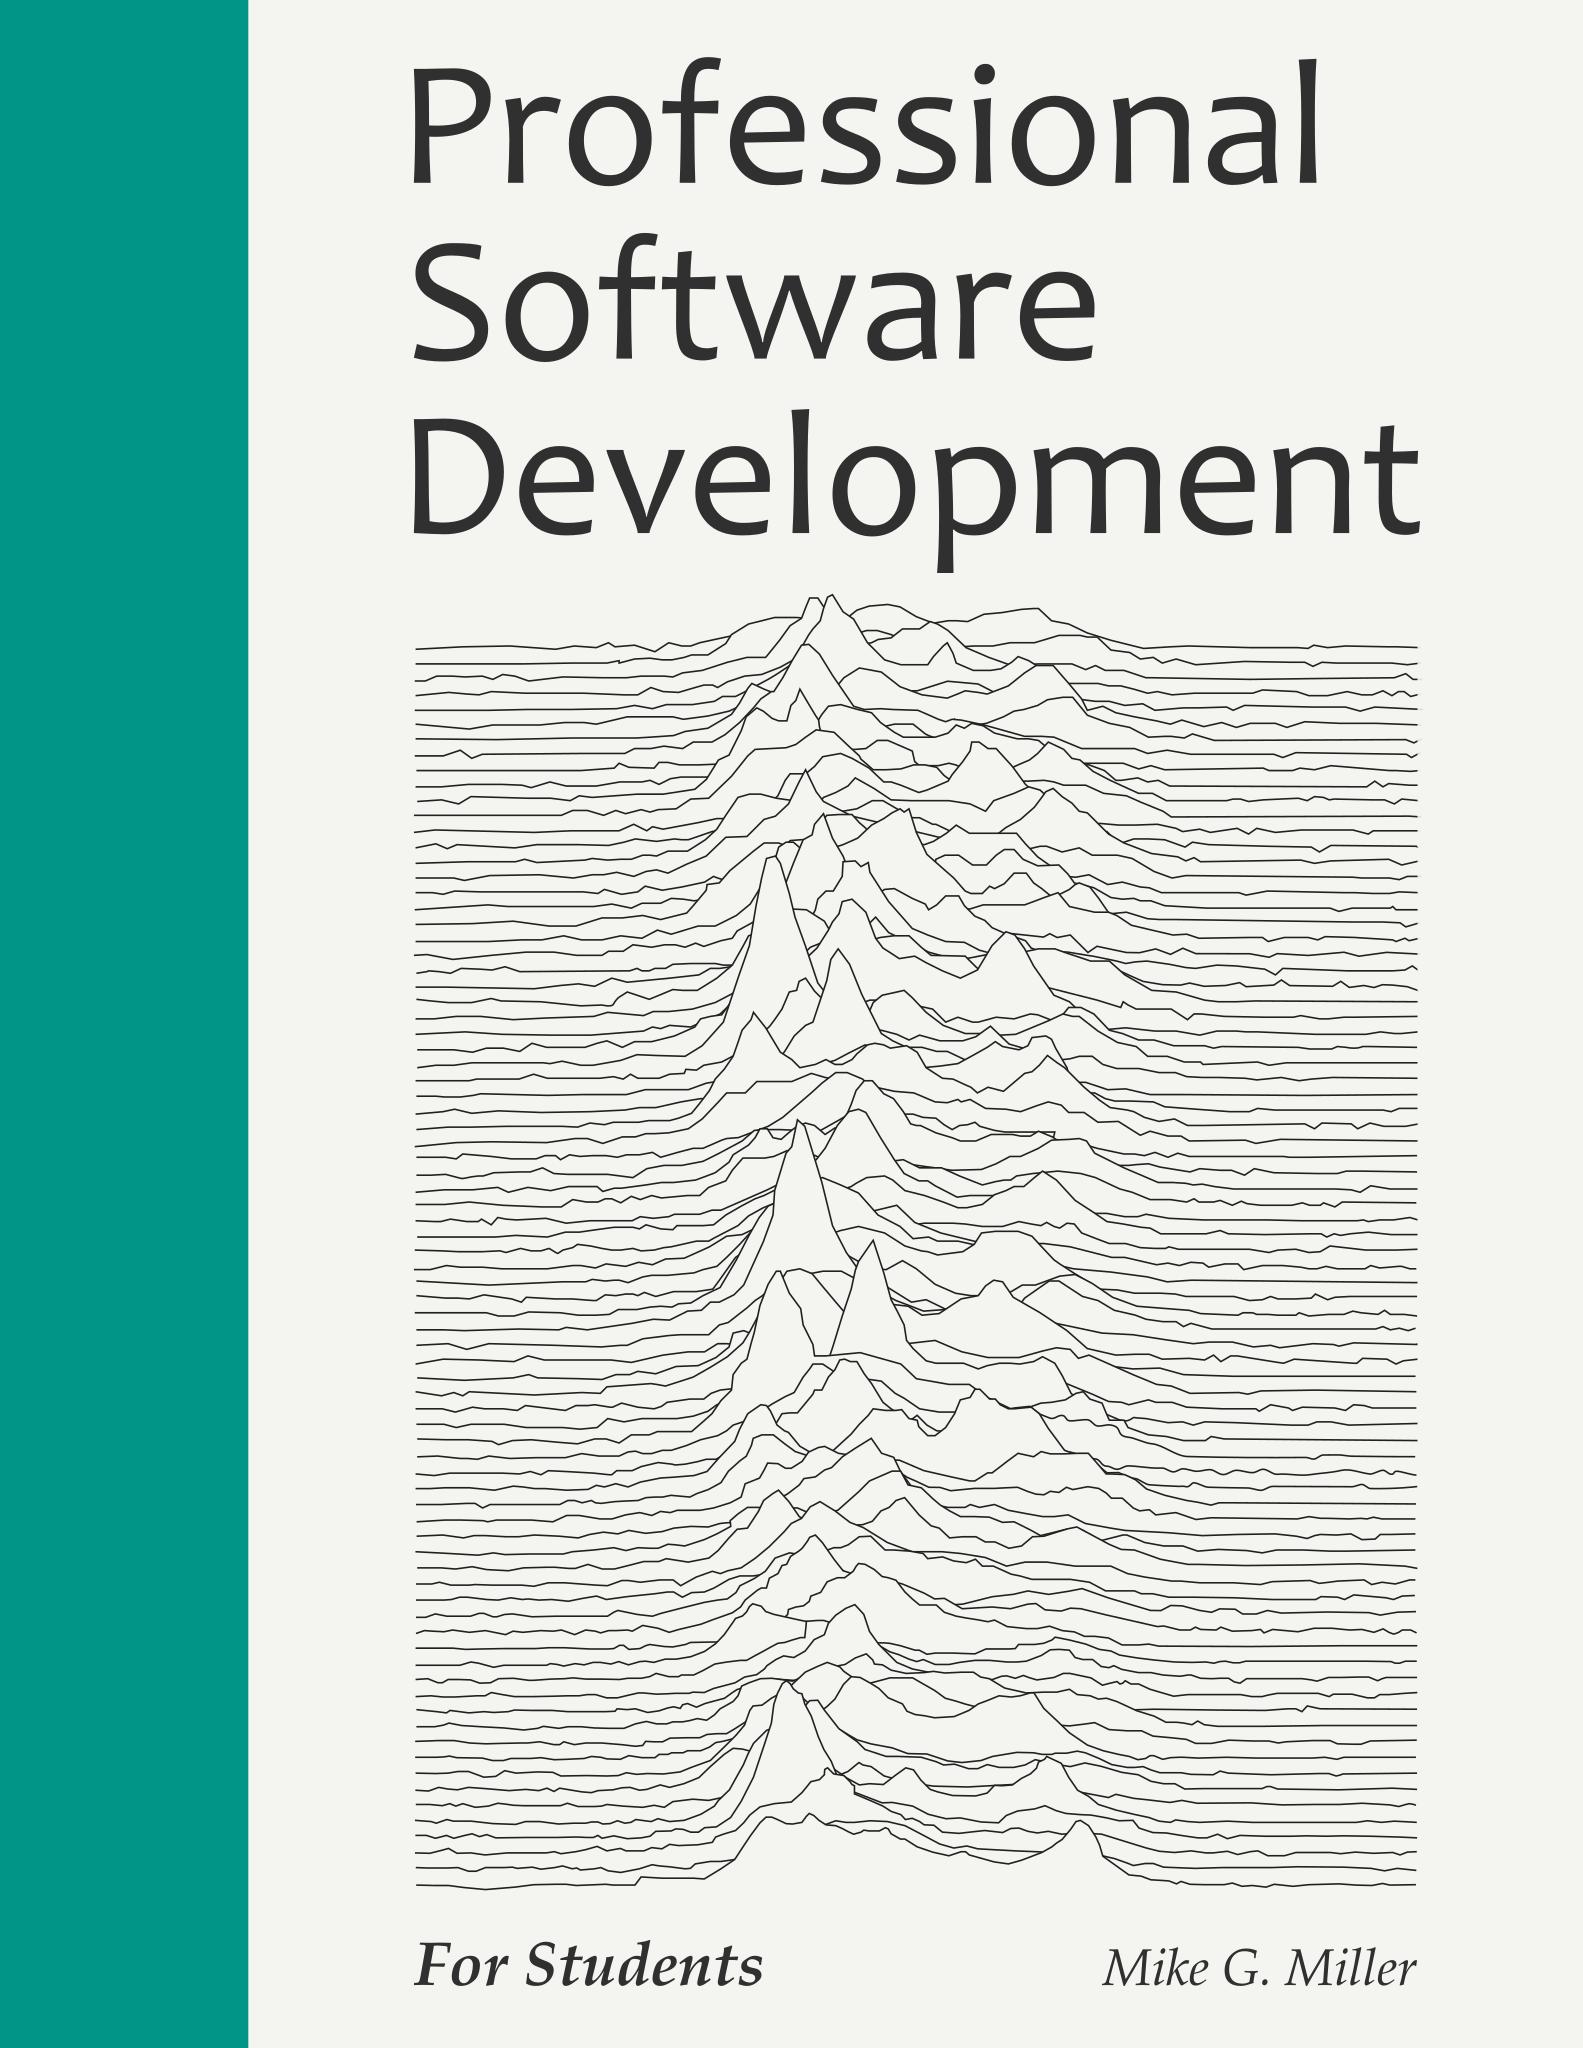 Contents — Professional Software Development 2019.01